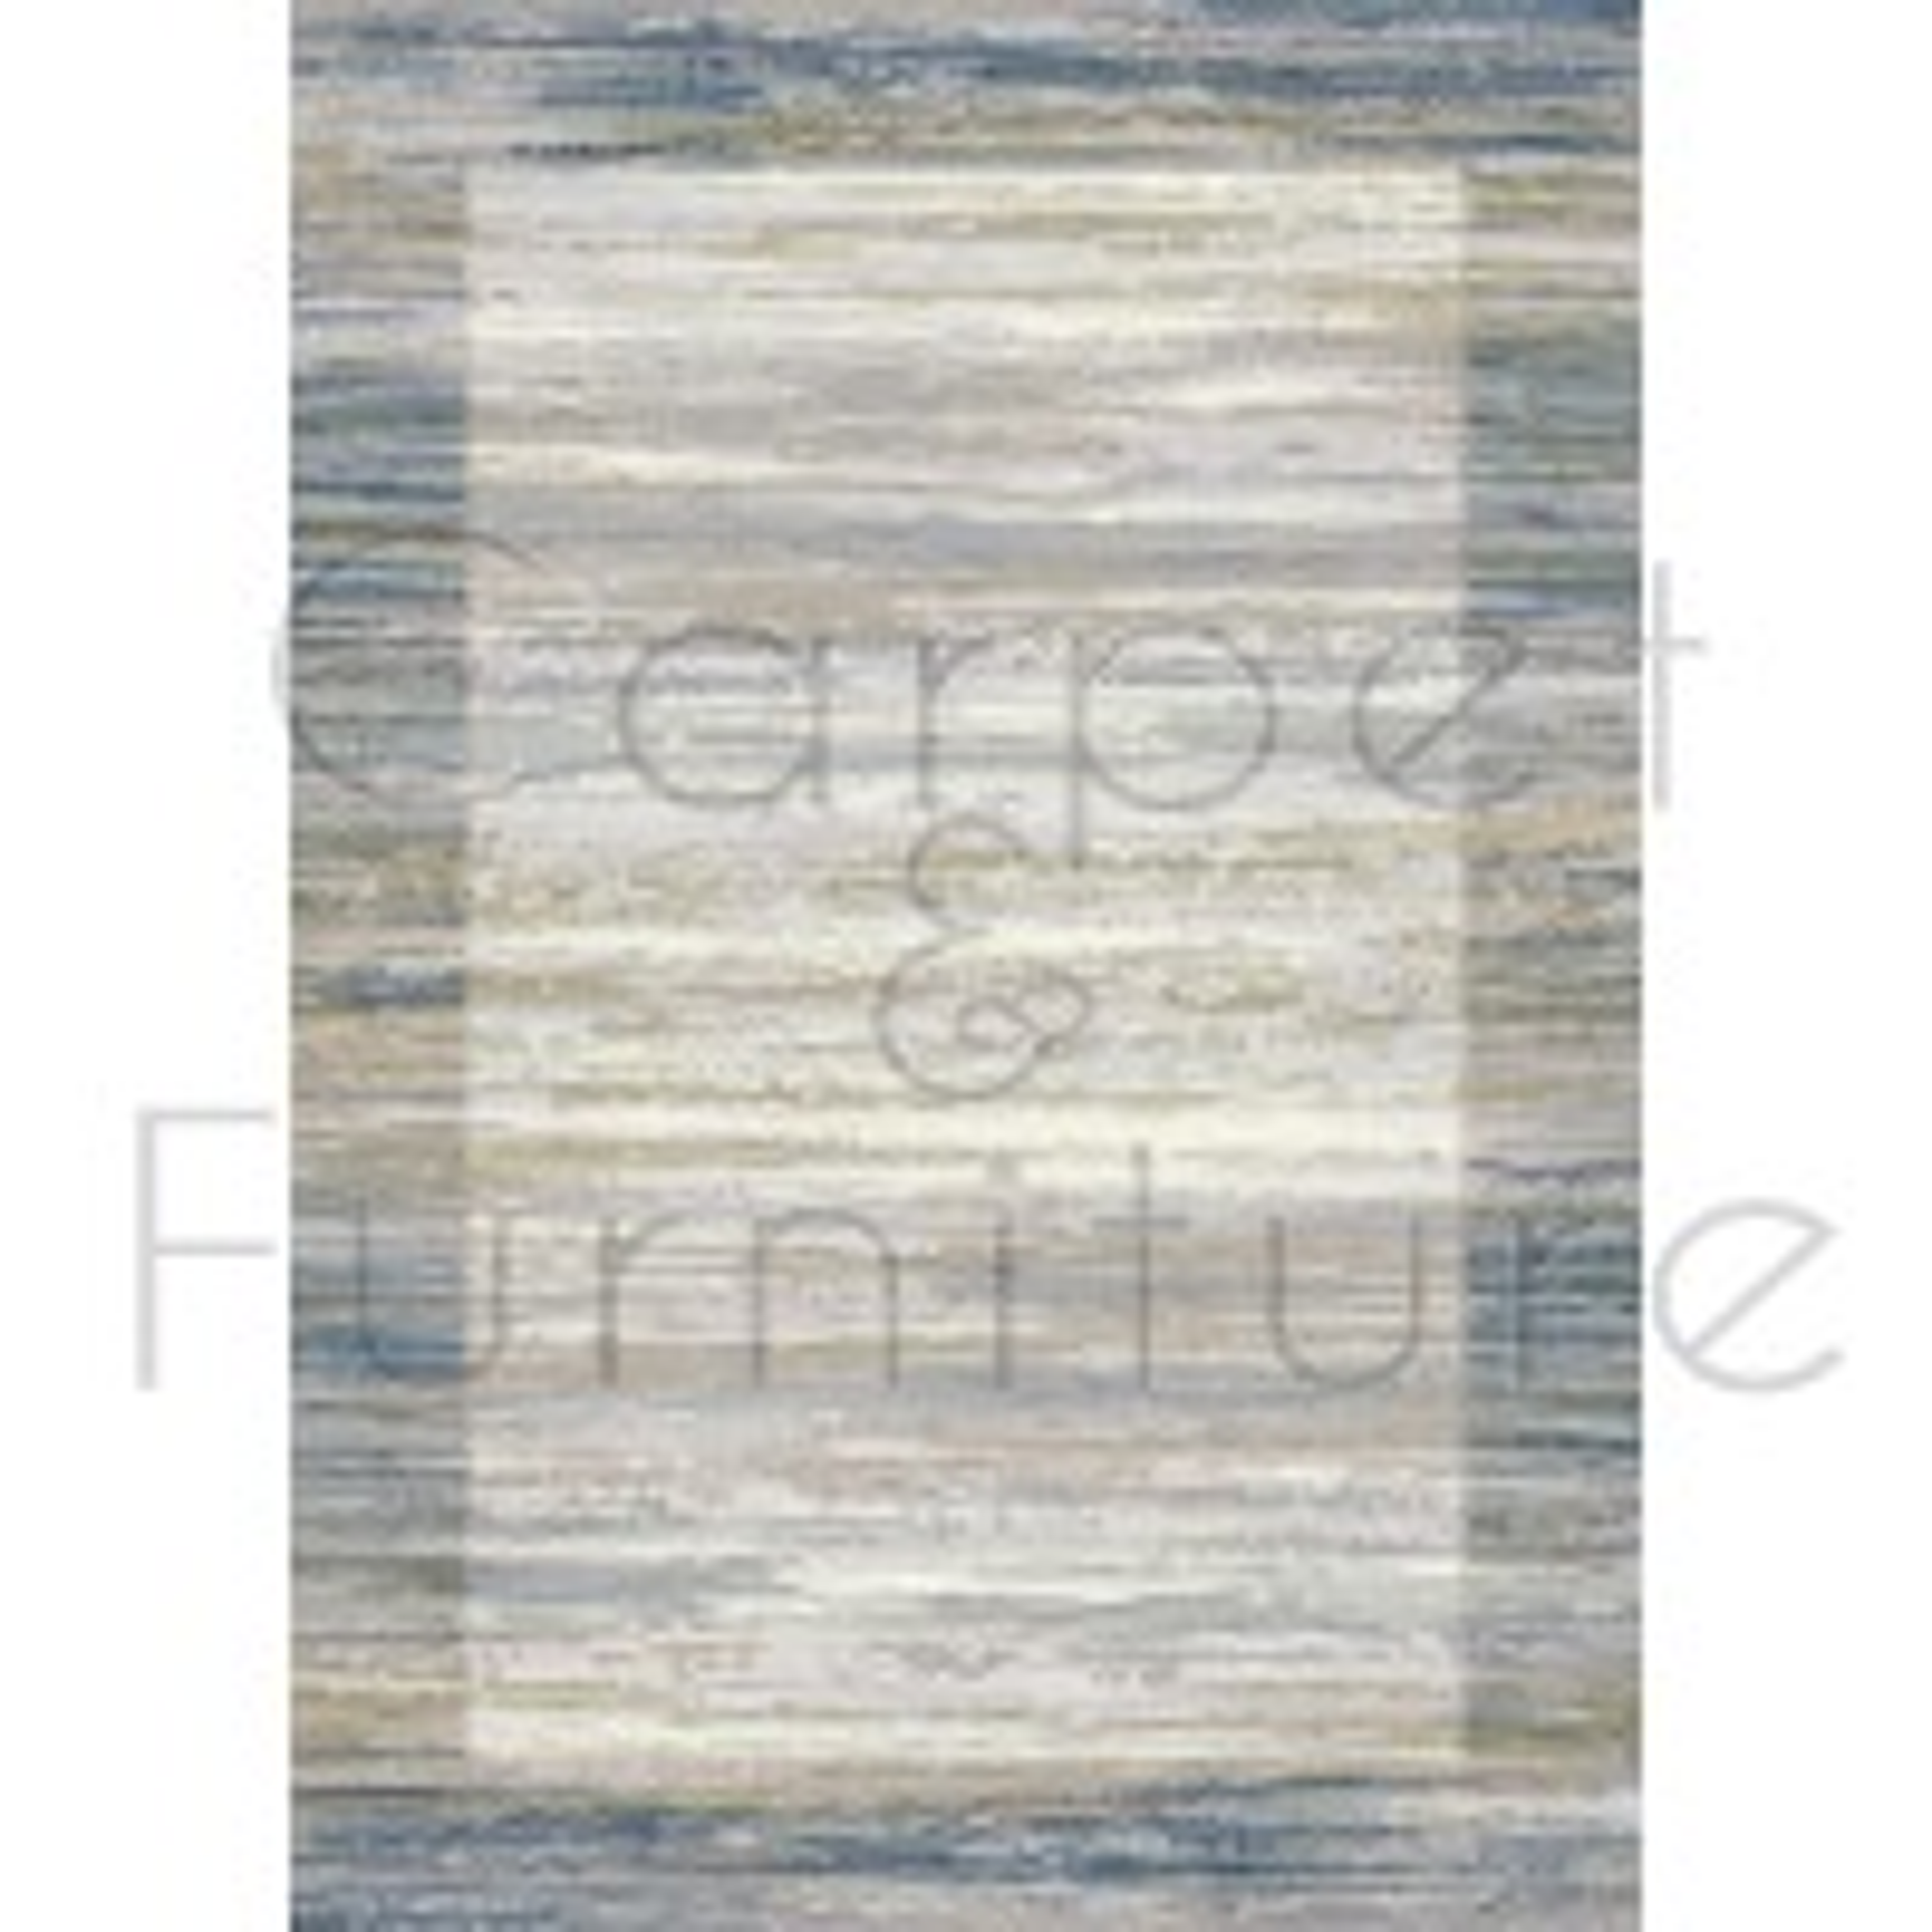 "Galleria Rug - Border Blue 63138 6191 - Size 200 x 290 cm (6'7"" x 9'6"")"